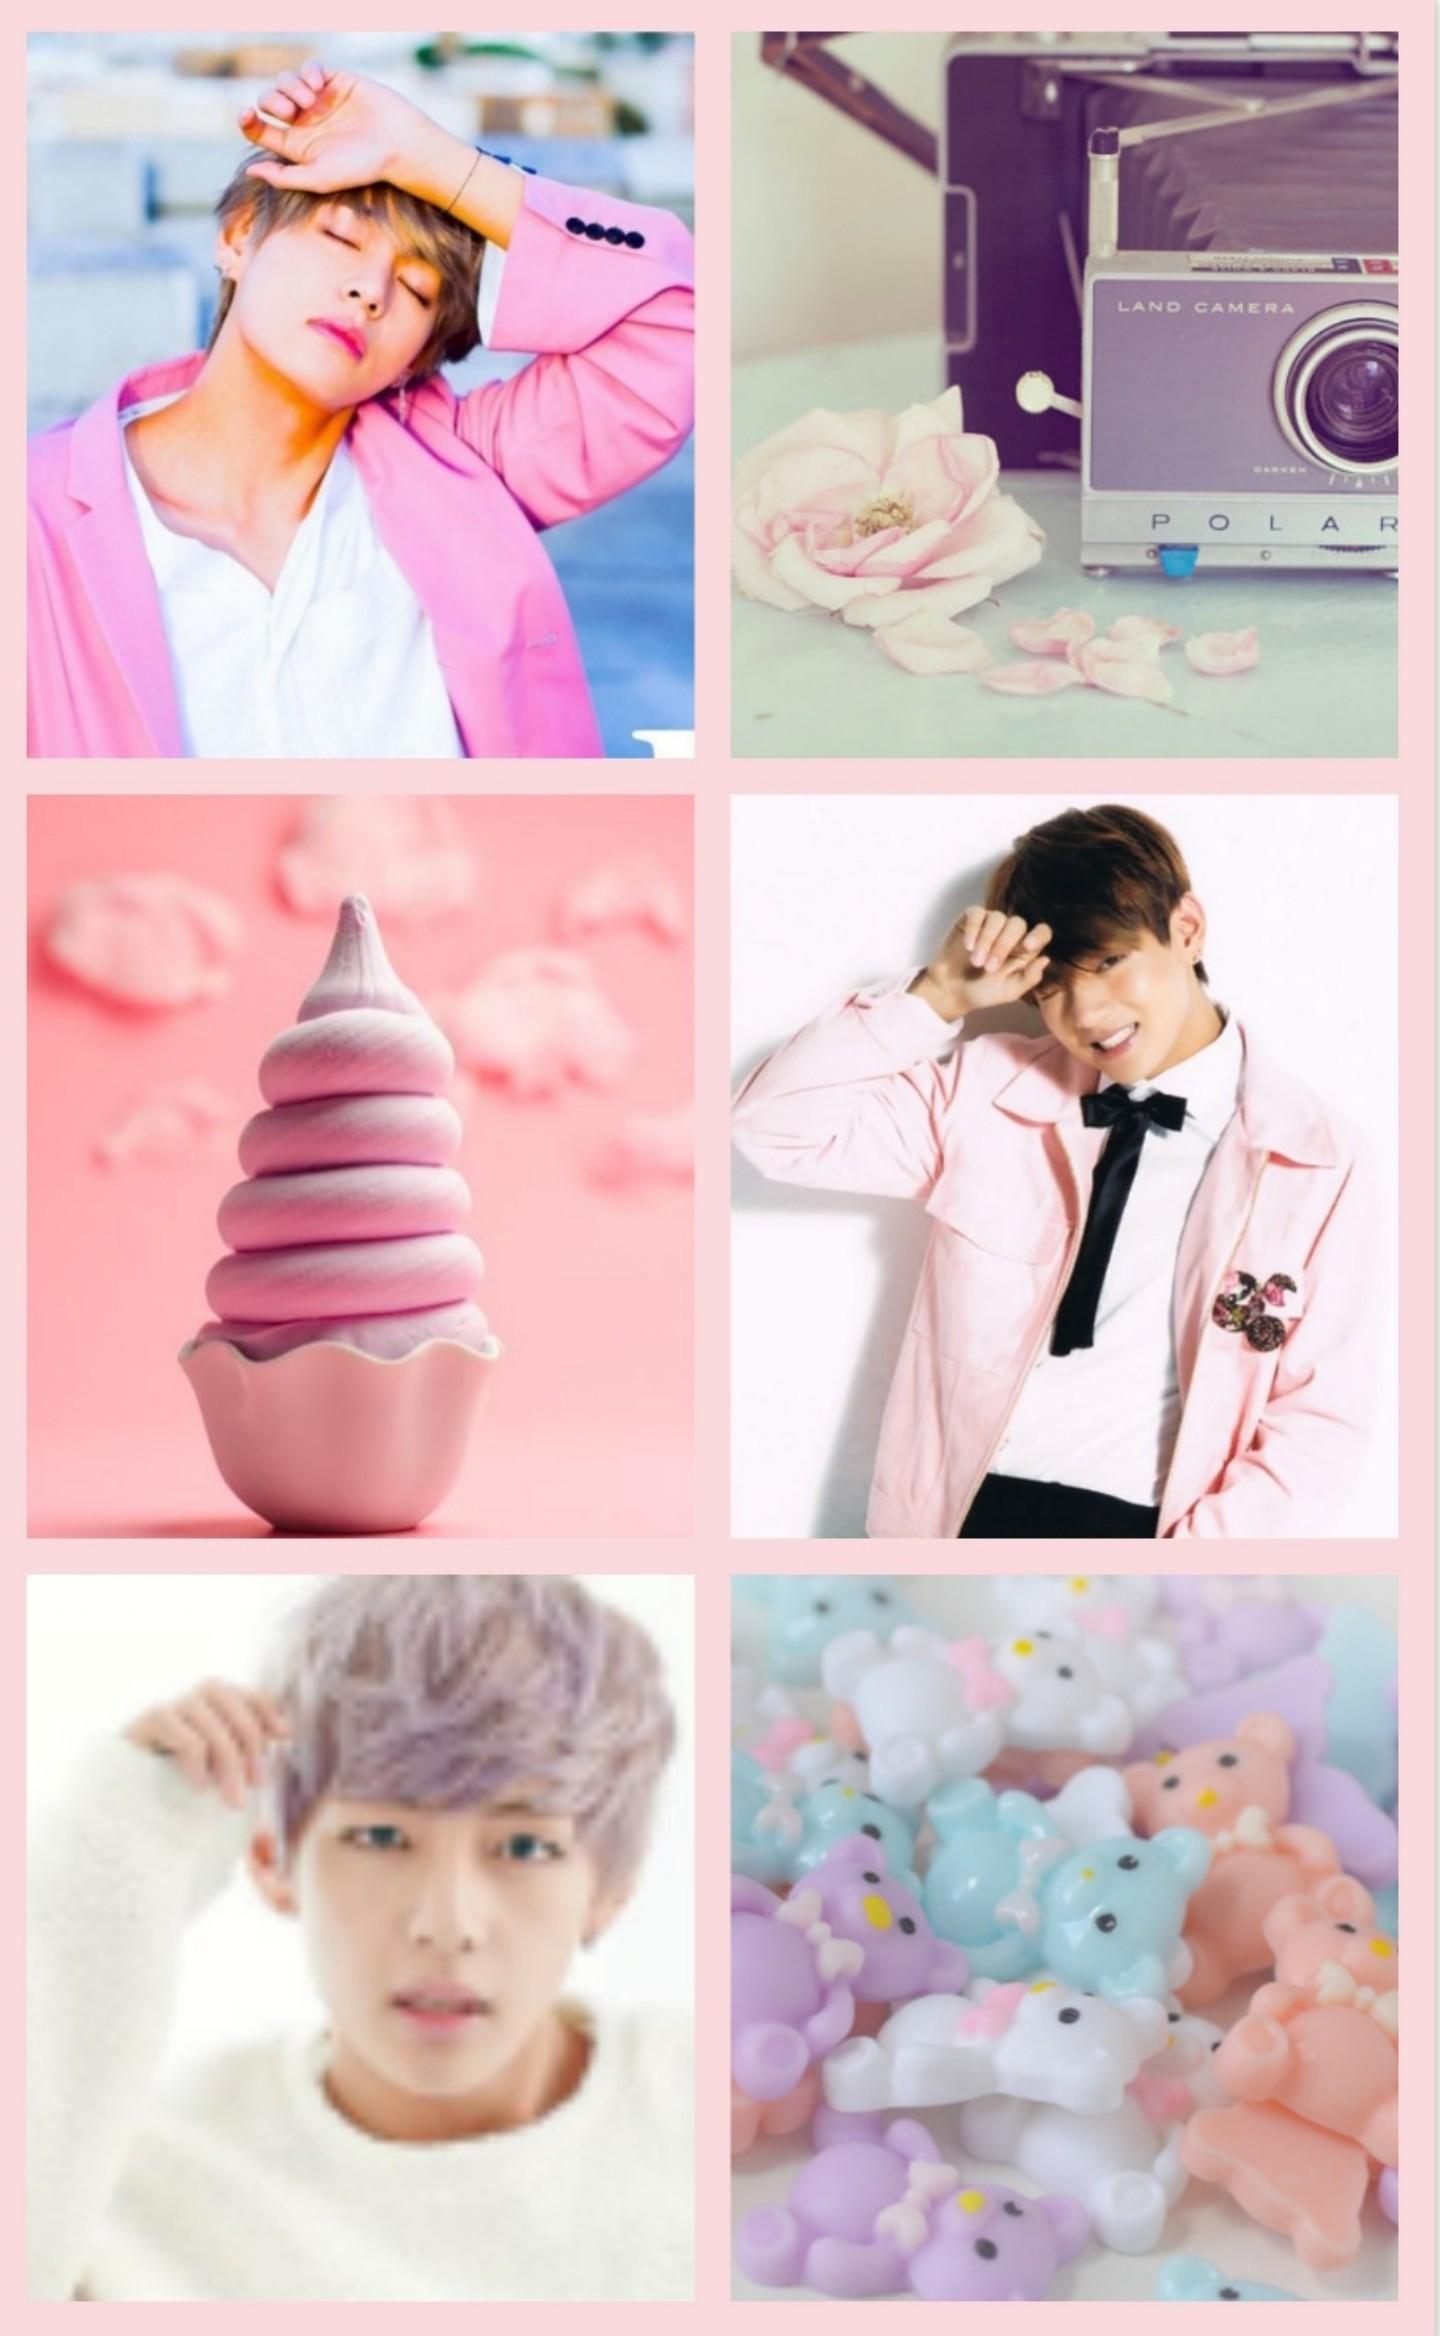 Collage by JamlessMeg